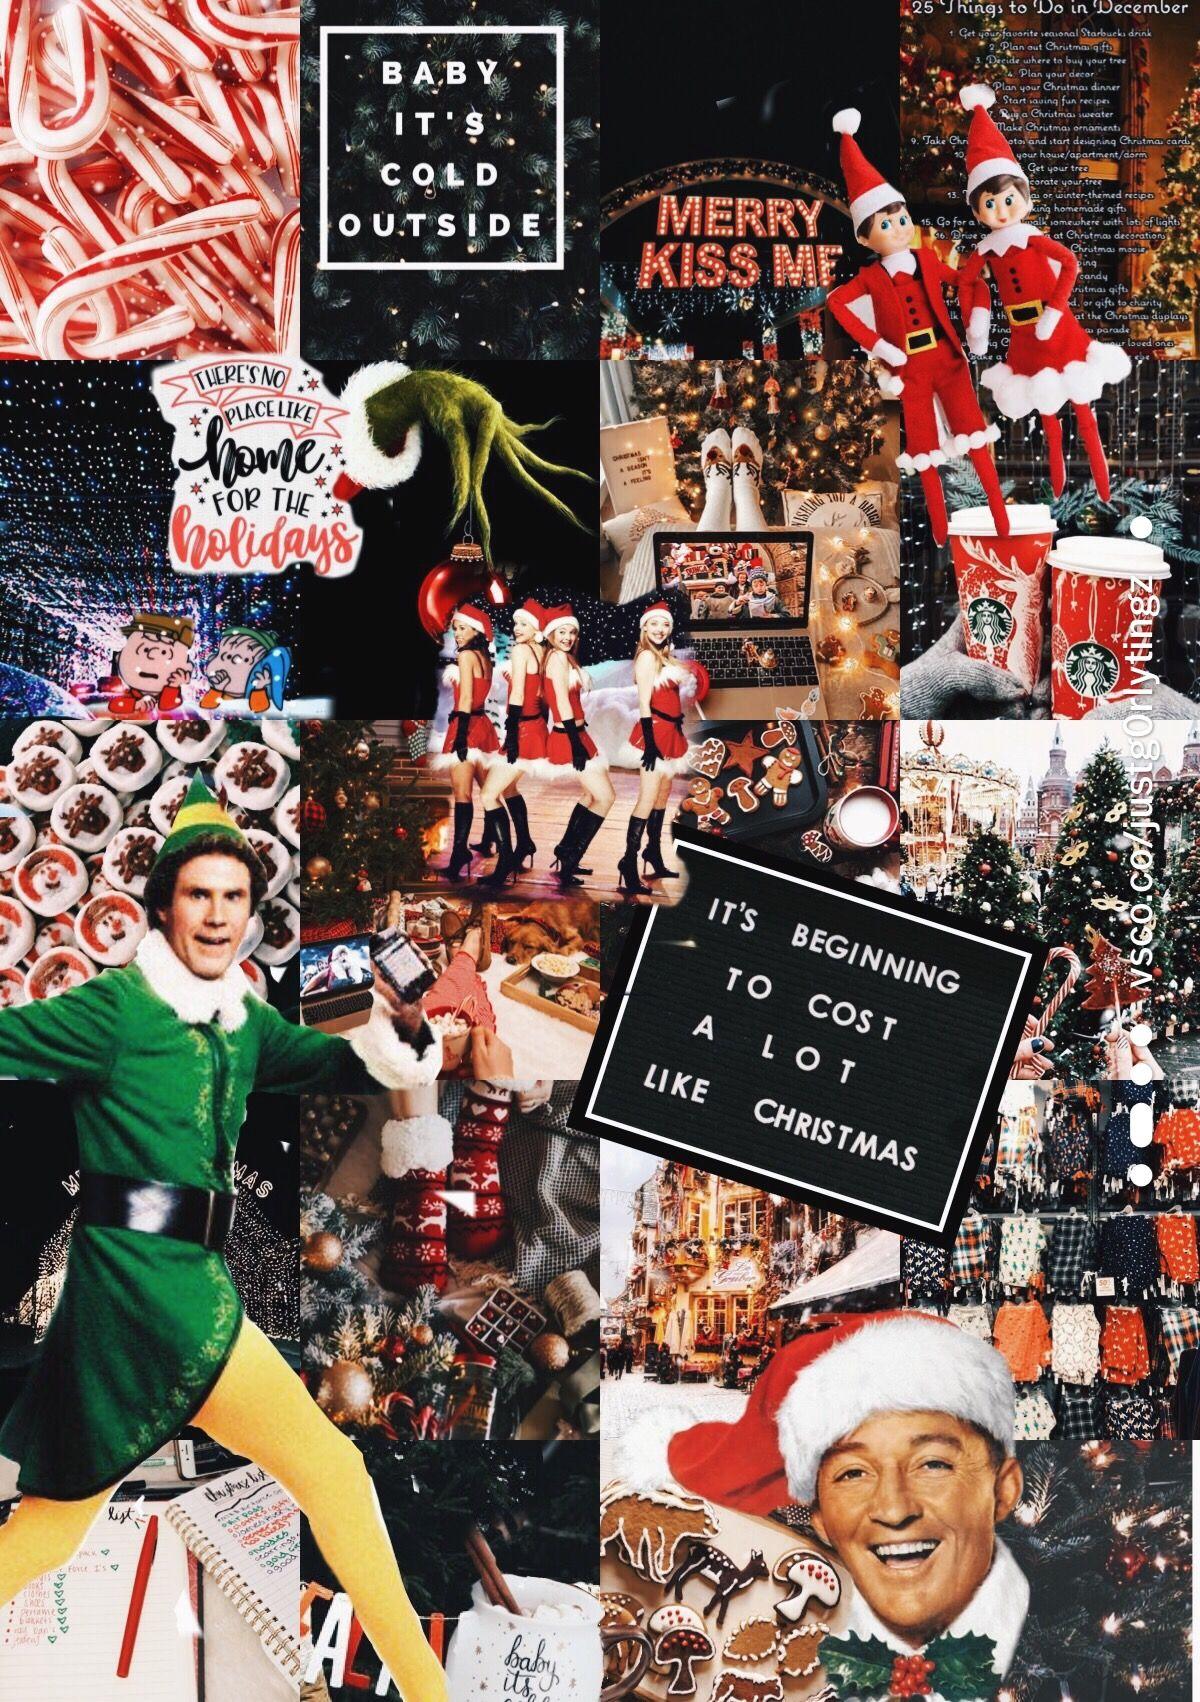 Christmas Collage Wallpaper Cute Christmas Wallpaper Christmas Collage Christmas Phone Wallpaper